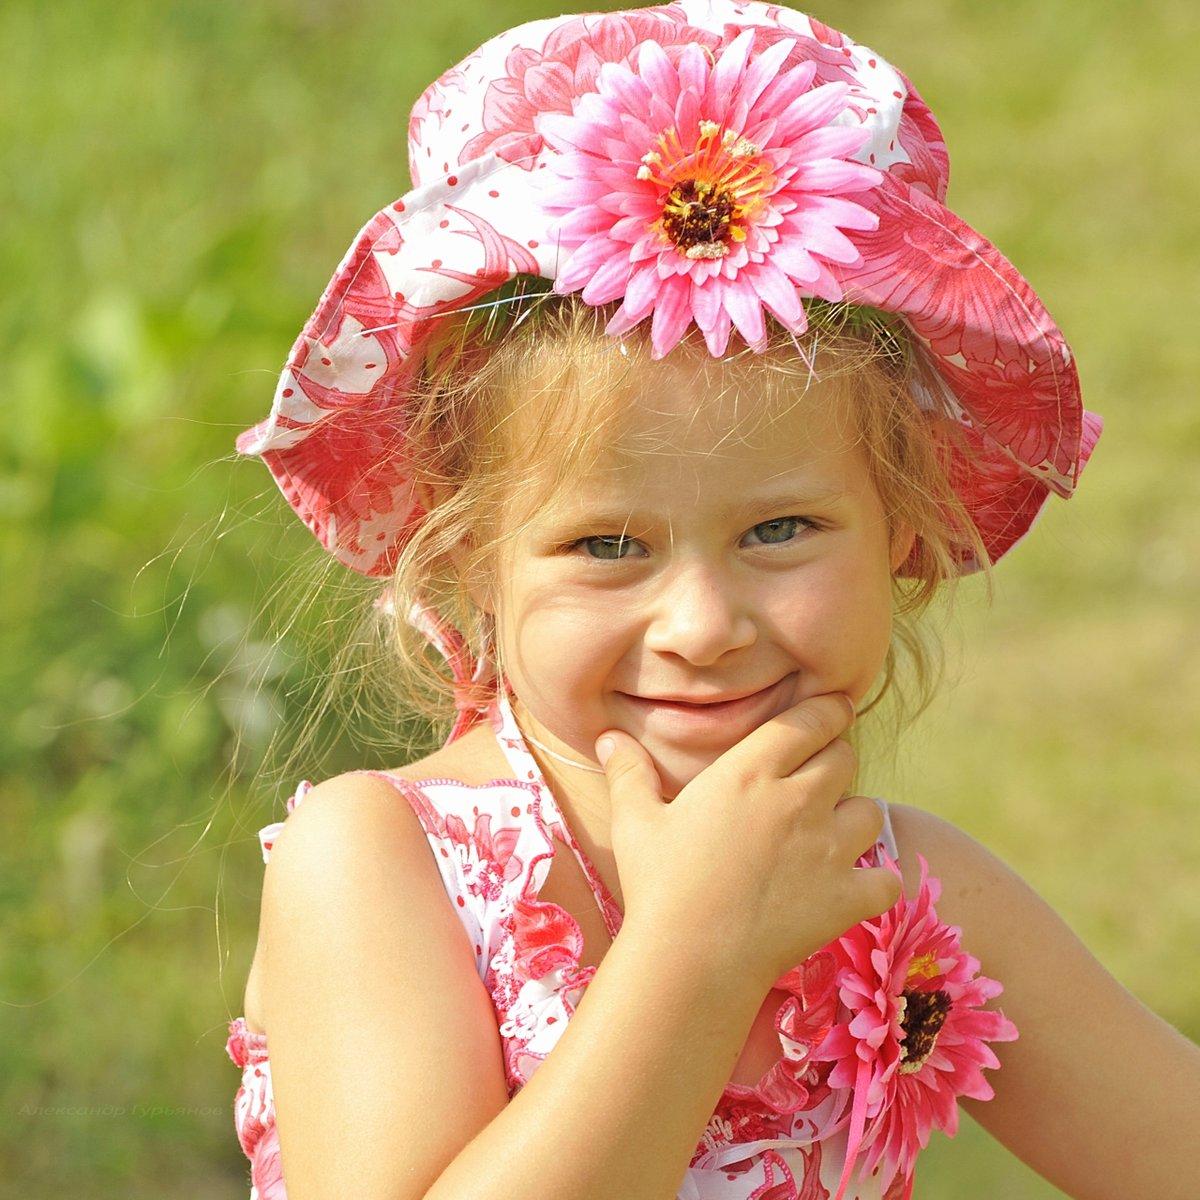 Картинки, картинки ах лето для детей